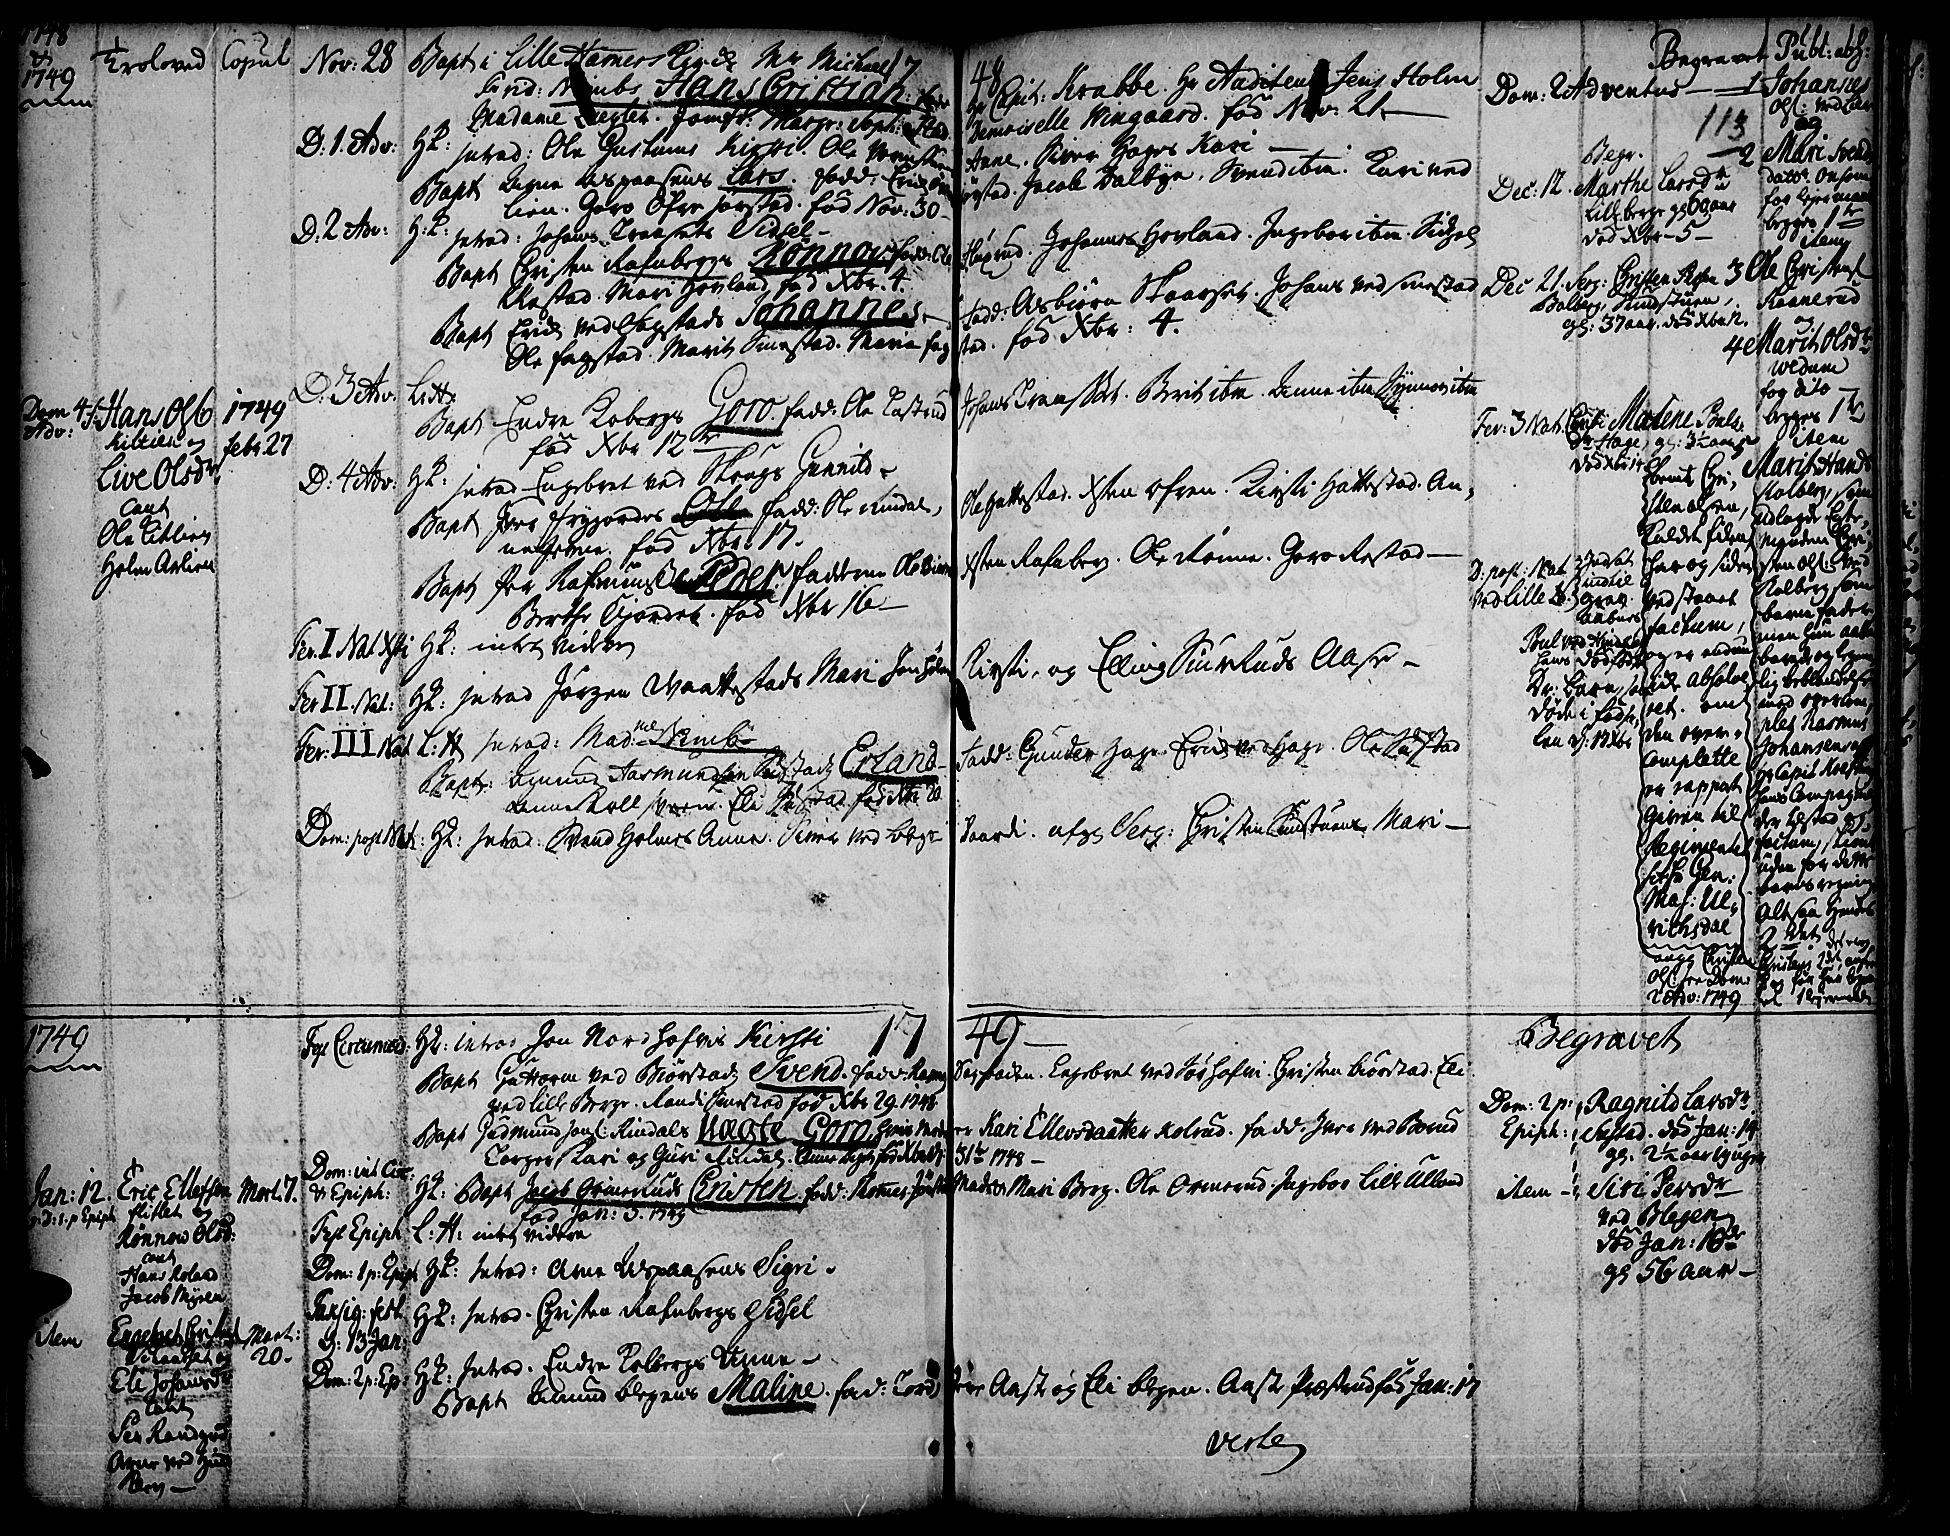 SAH, Fåberg prestekontor, Ministerialbok nr. 1, 1727-1775, s. 113